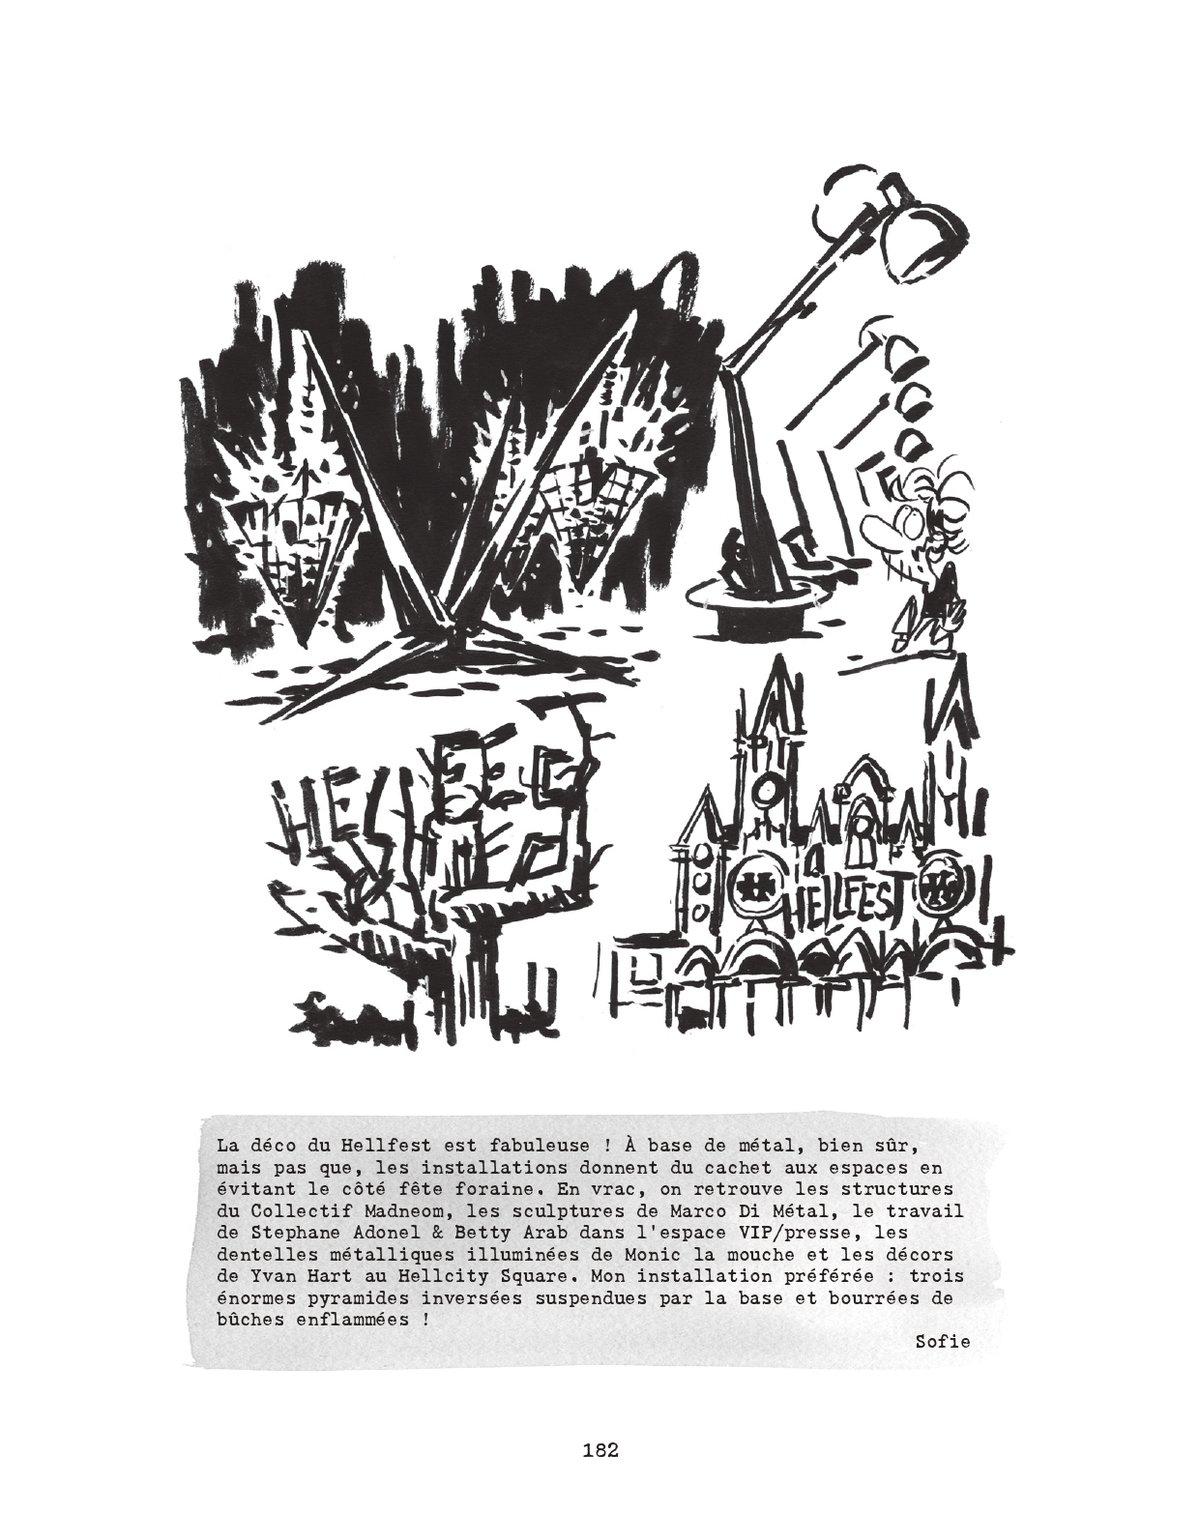 Image of Welcome to HELL(fest) L'INTÉGRALE - 8 ans de HELLFEST en BD reportage (2012-2019)